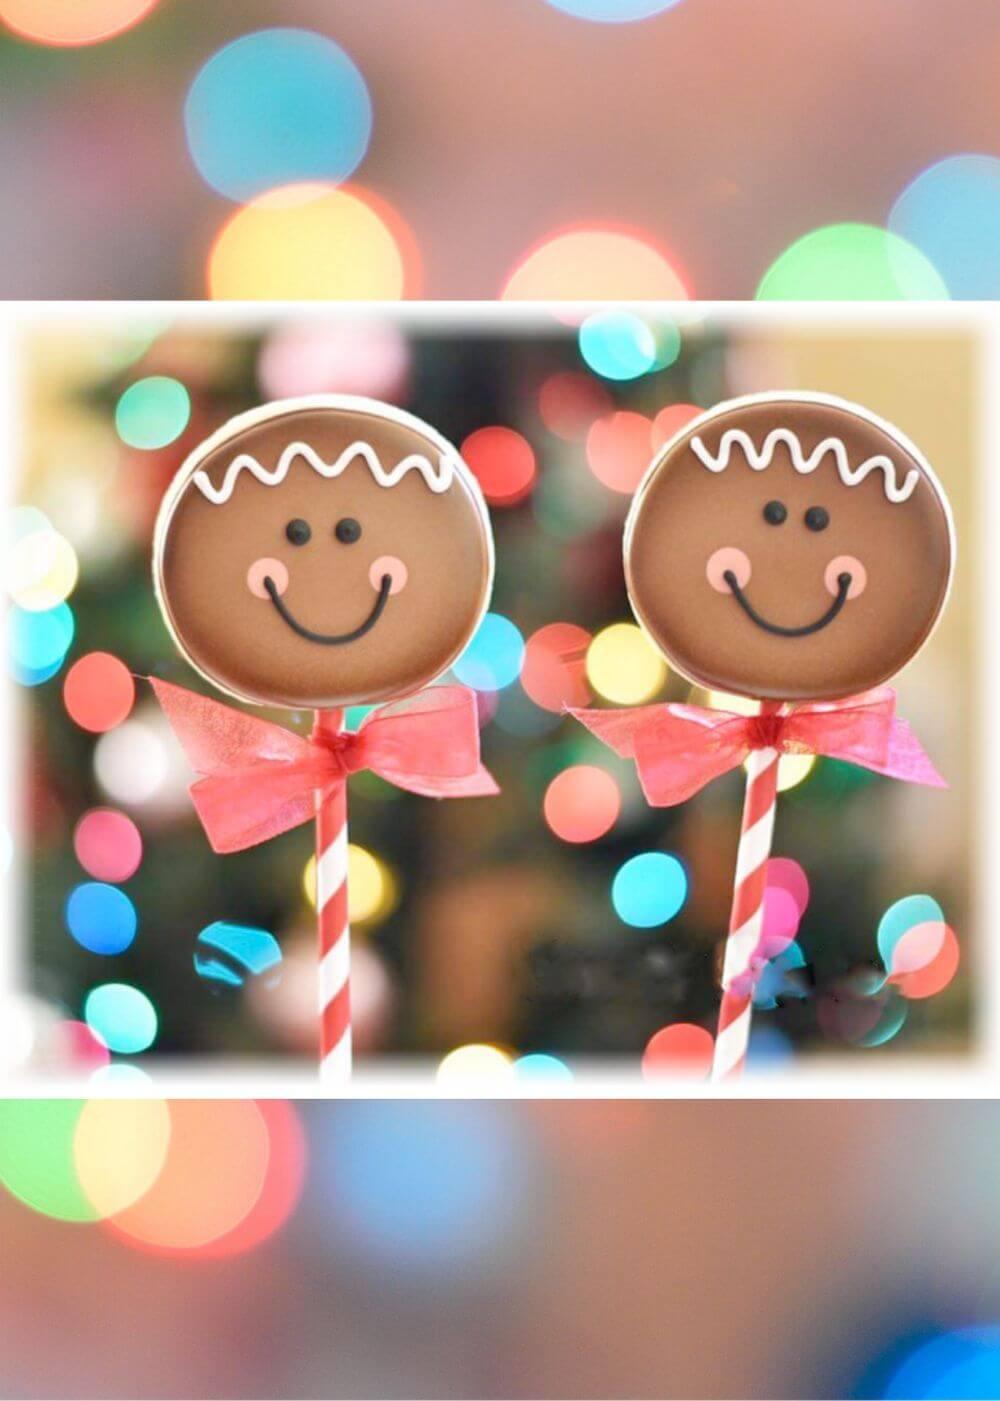 Name-Gingerbread pops 1_Tag-Celebrations Vignettes_Season-Winter Christmas